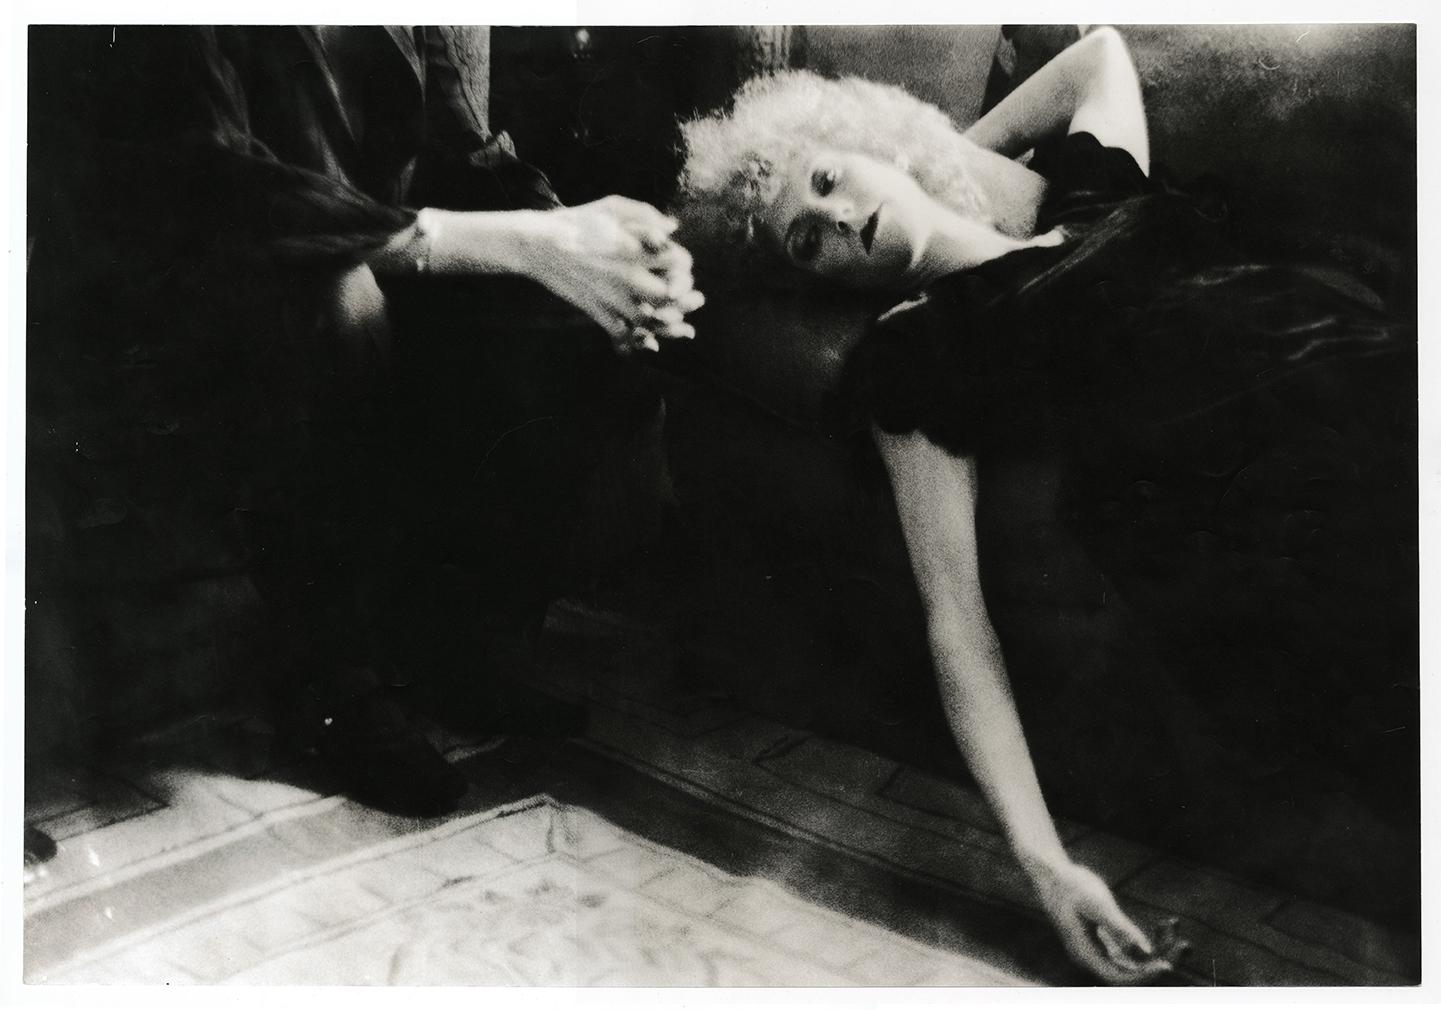 Untitled, 1976  | photograph by Deborah Turbeville